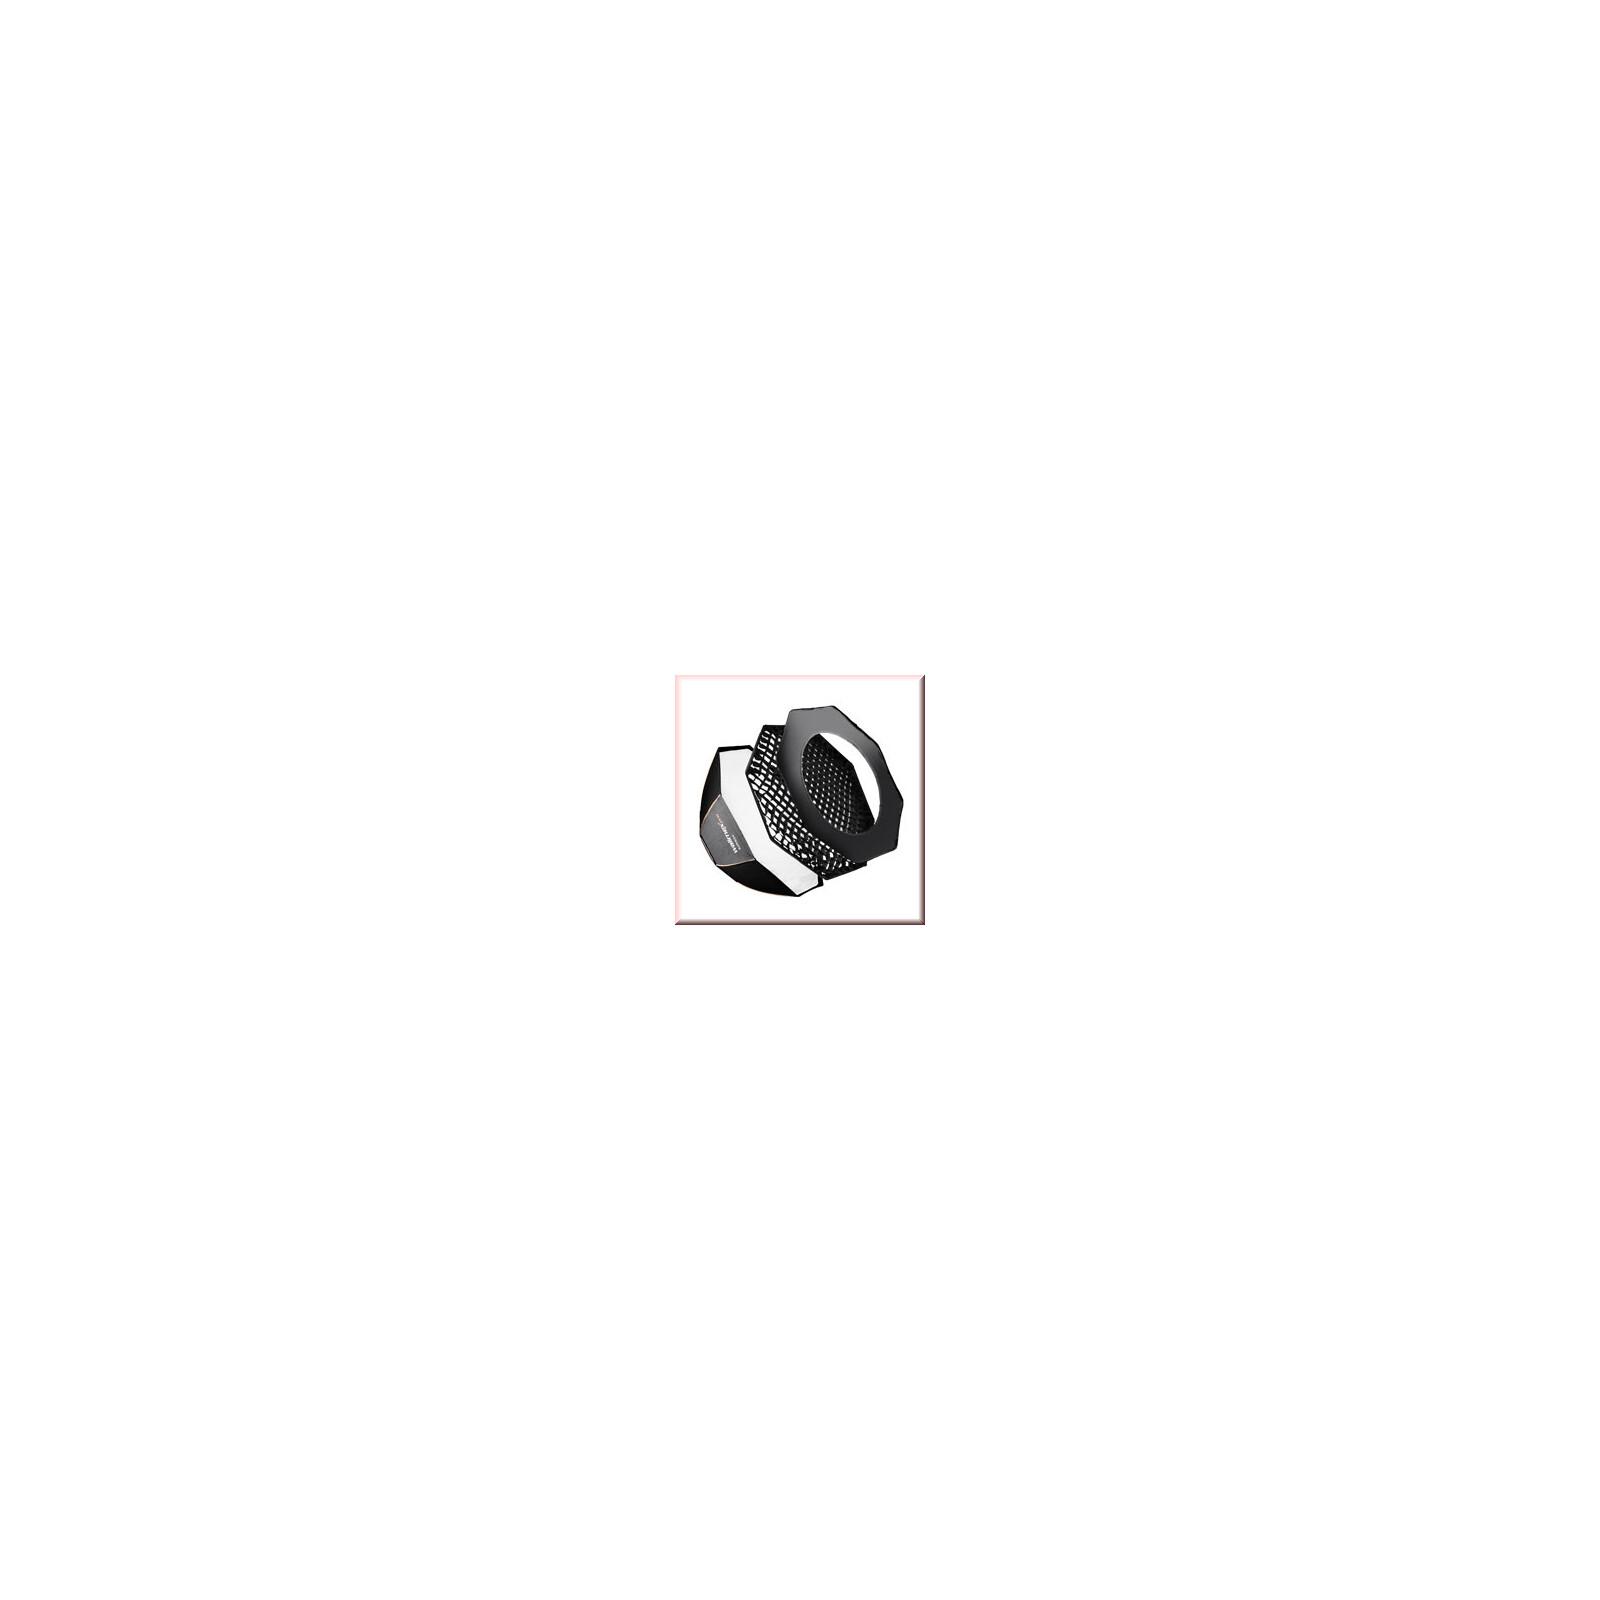 walimex pro Octa Softbox PLUS OL Ø60 Auro./Bowens